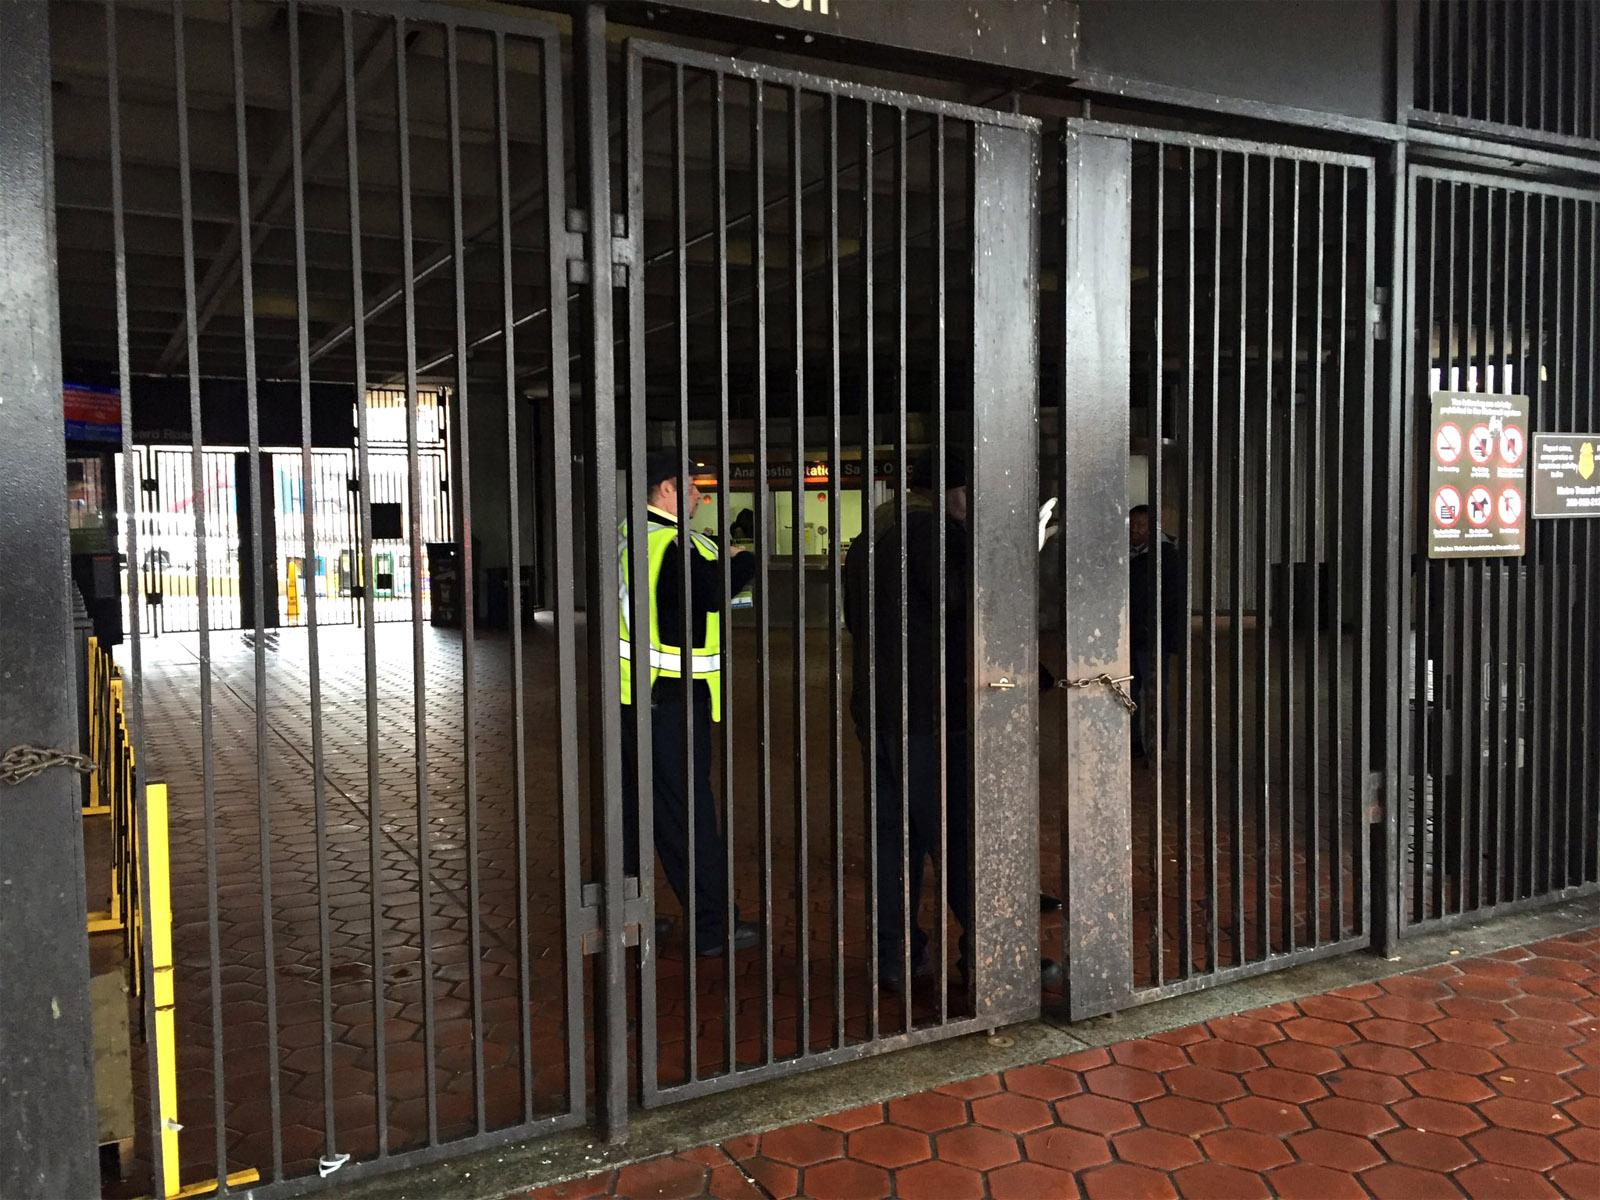 Police: 16-year-old shot man at Anacostia Metro Station | WTOP